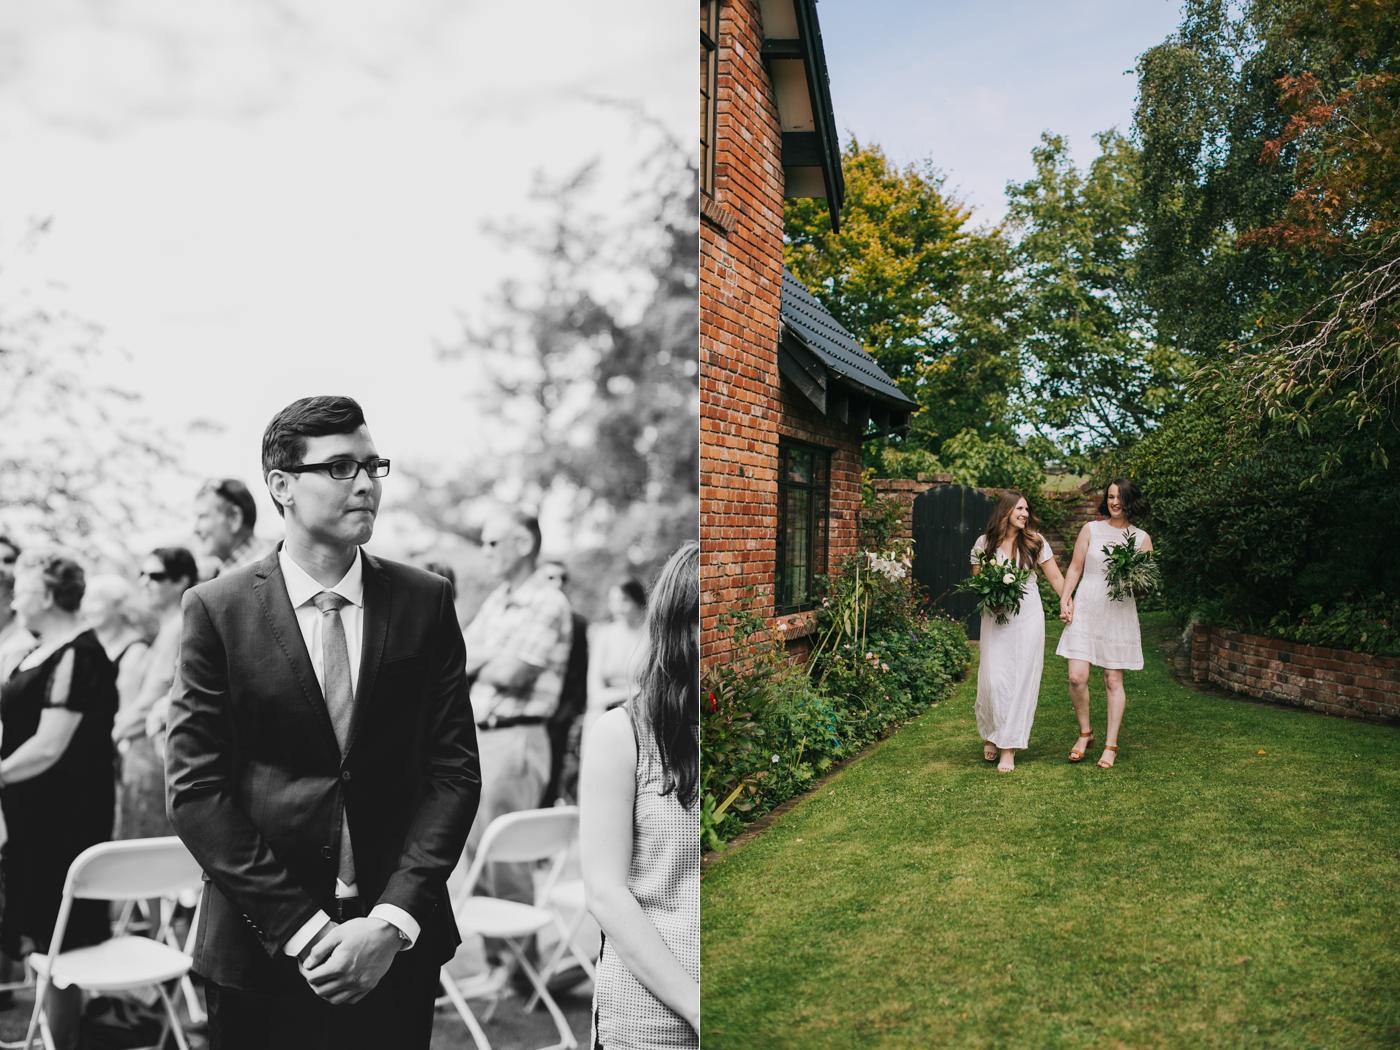 Ariana & Tim - Dunedin, New Zealand Wedding - Destination Wedding - Samantha Heather Photography-78.jpg